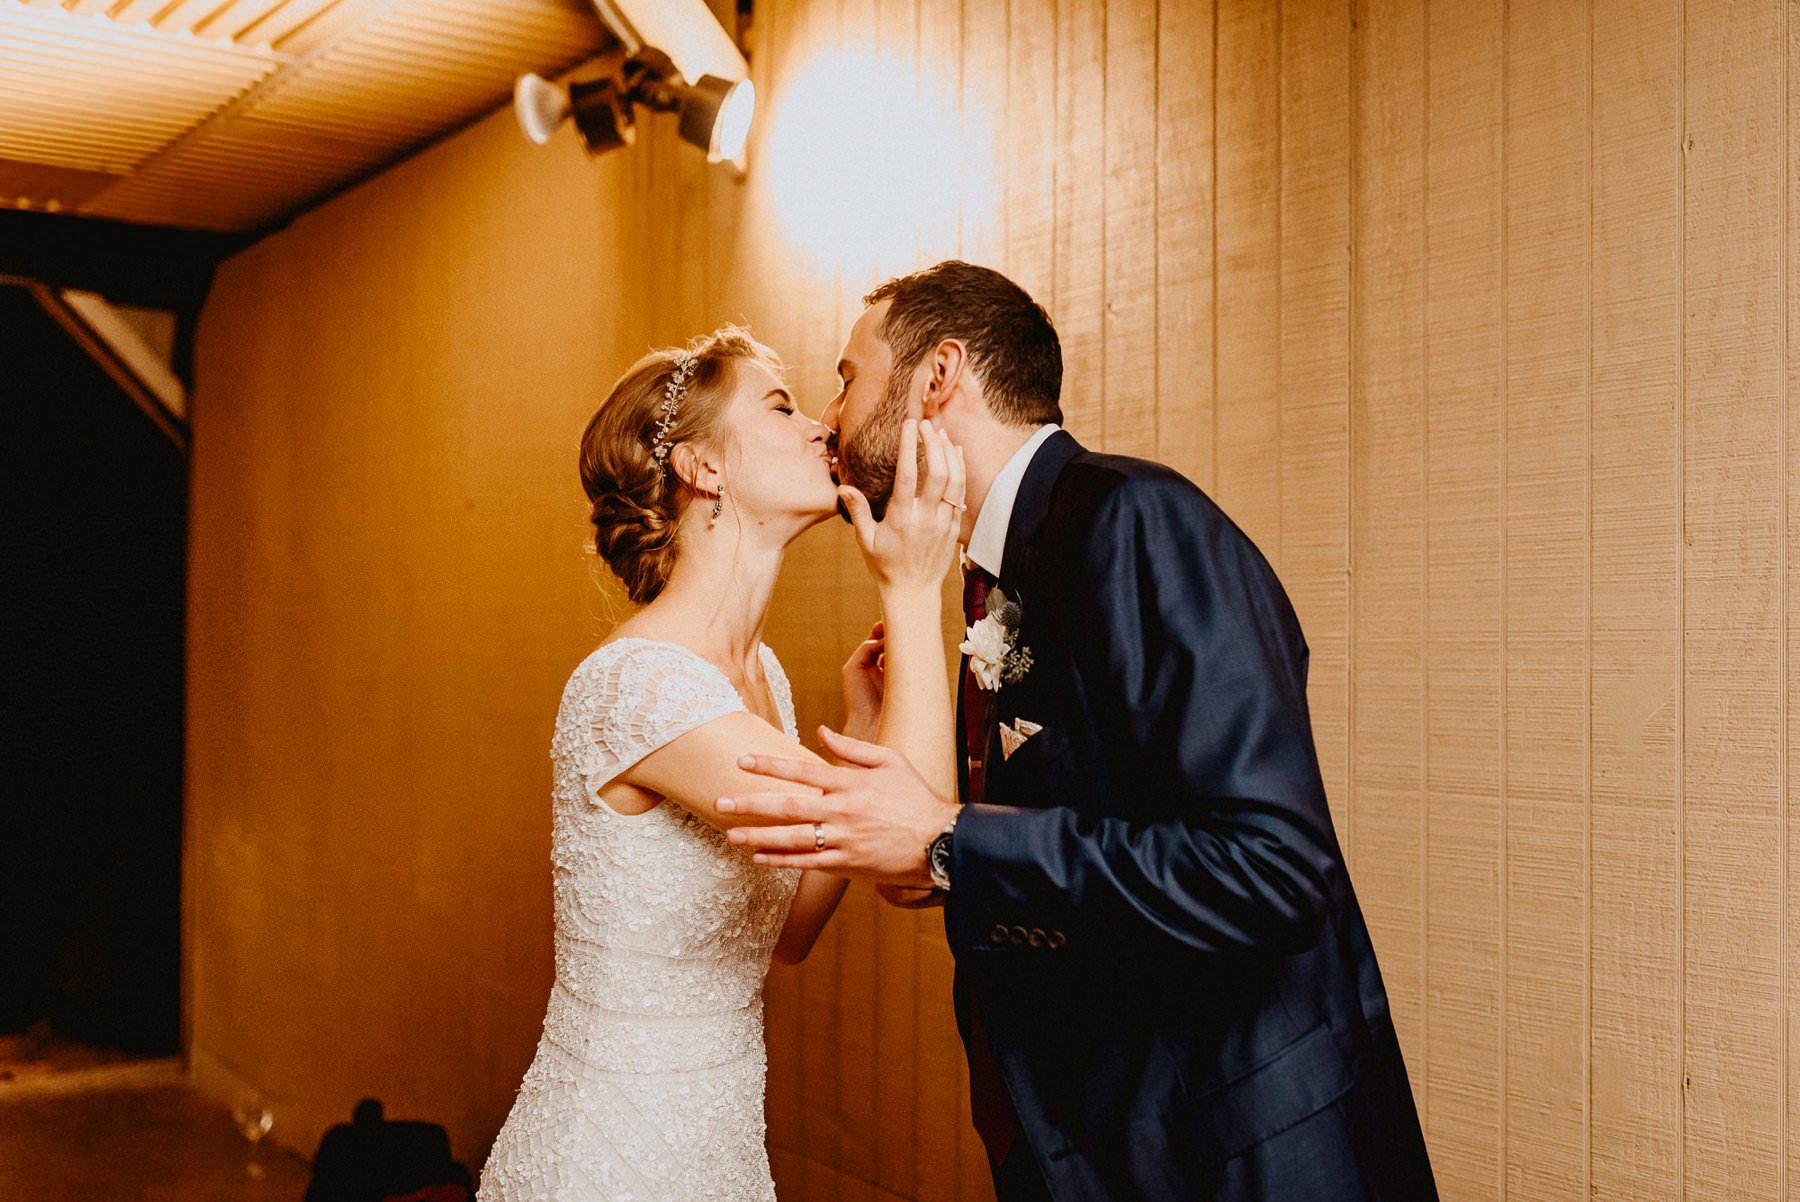 John_James_Audubon_Center_wedding-80.jpg